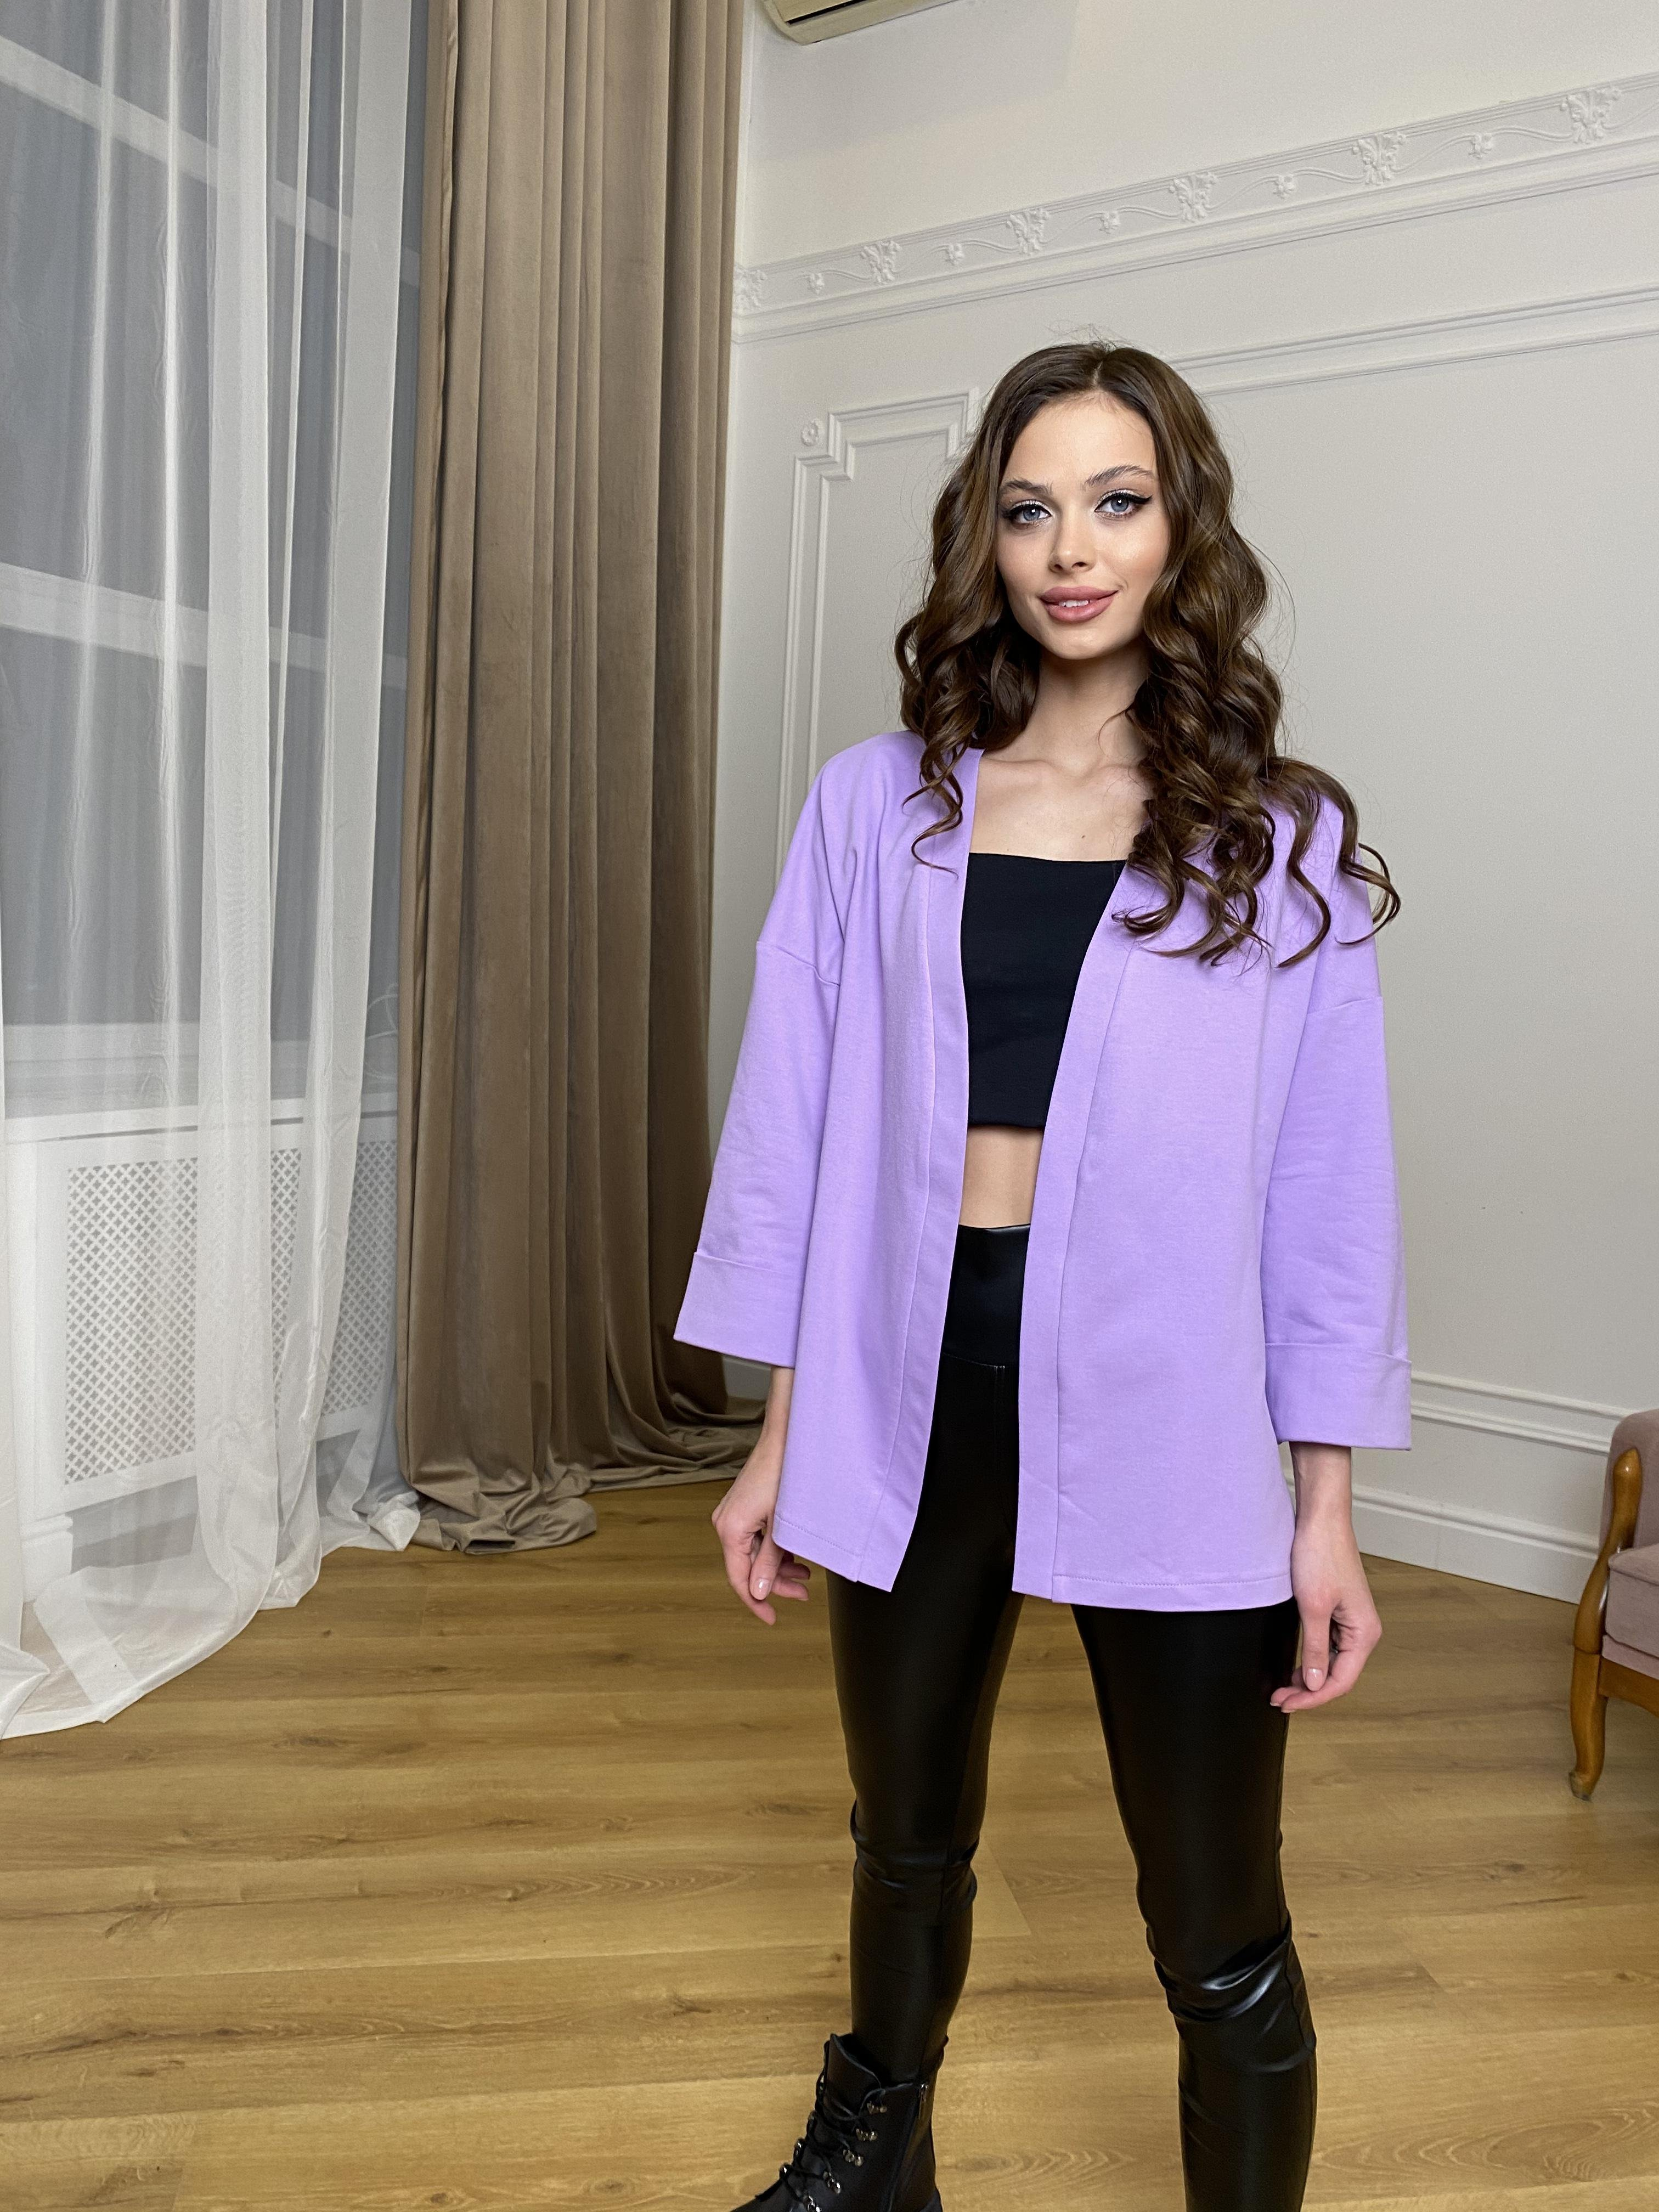 Жакет Лаванда 9665 АРТ. 45975 Цвет: лаванда - фото 2, интернет магазин tm-modus.ru